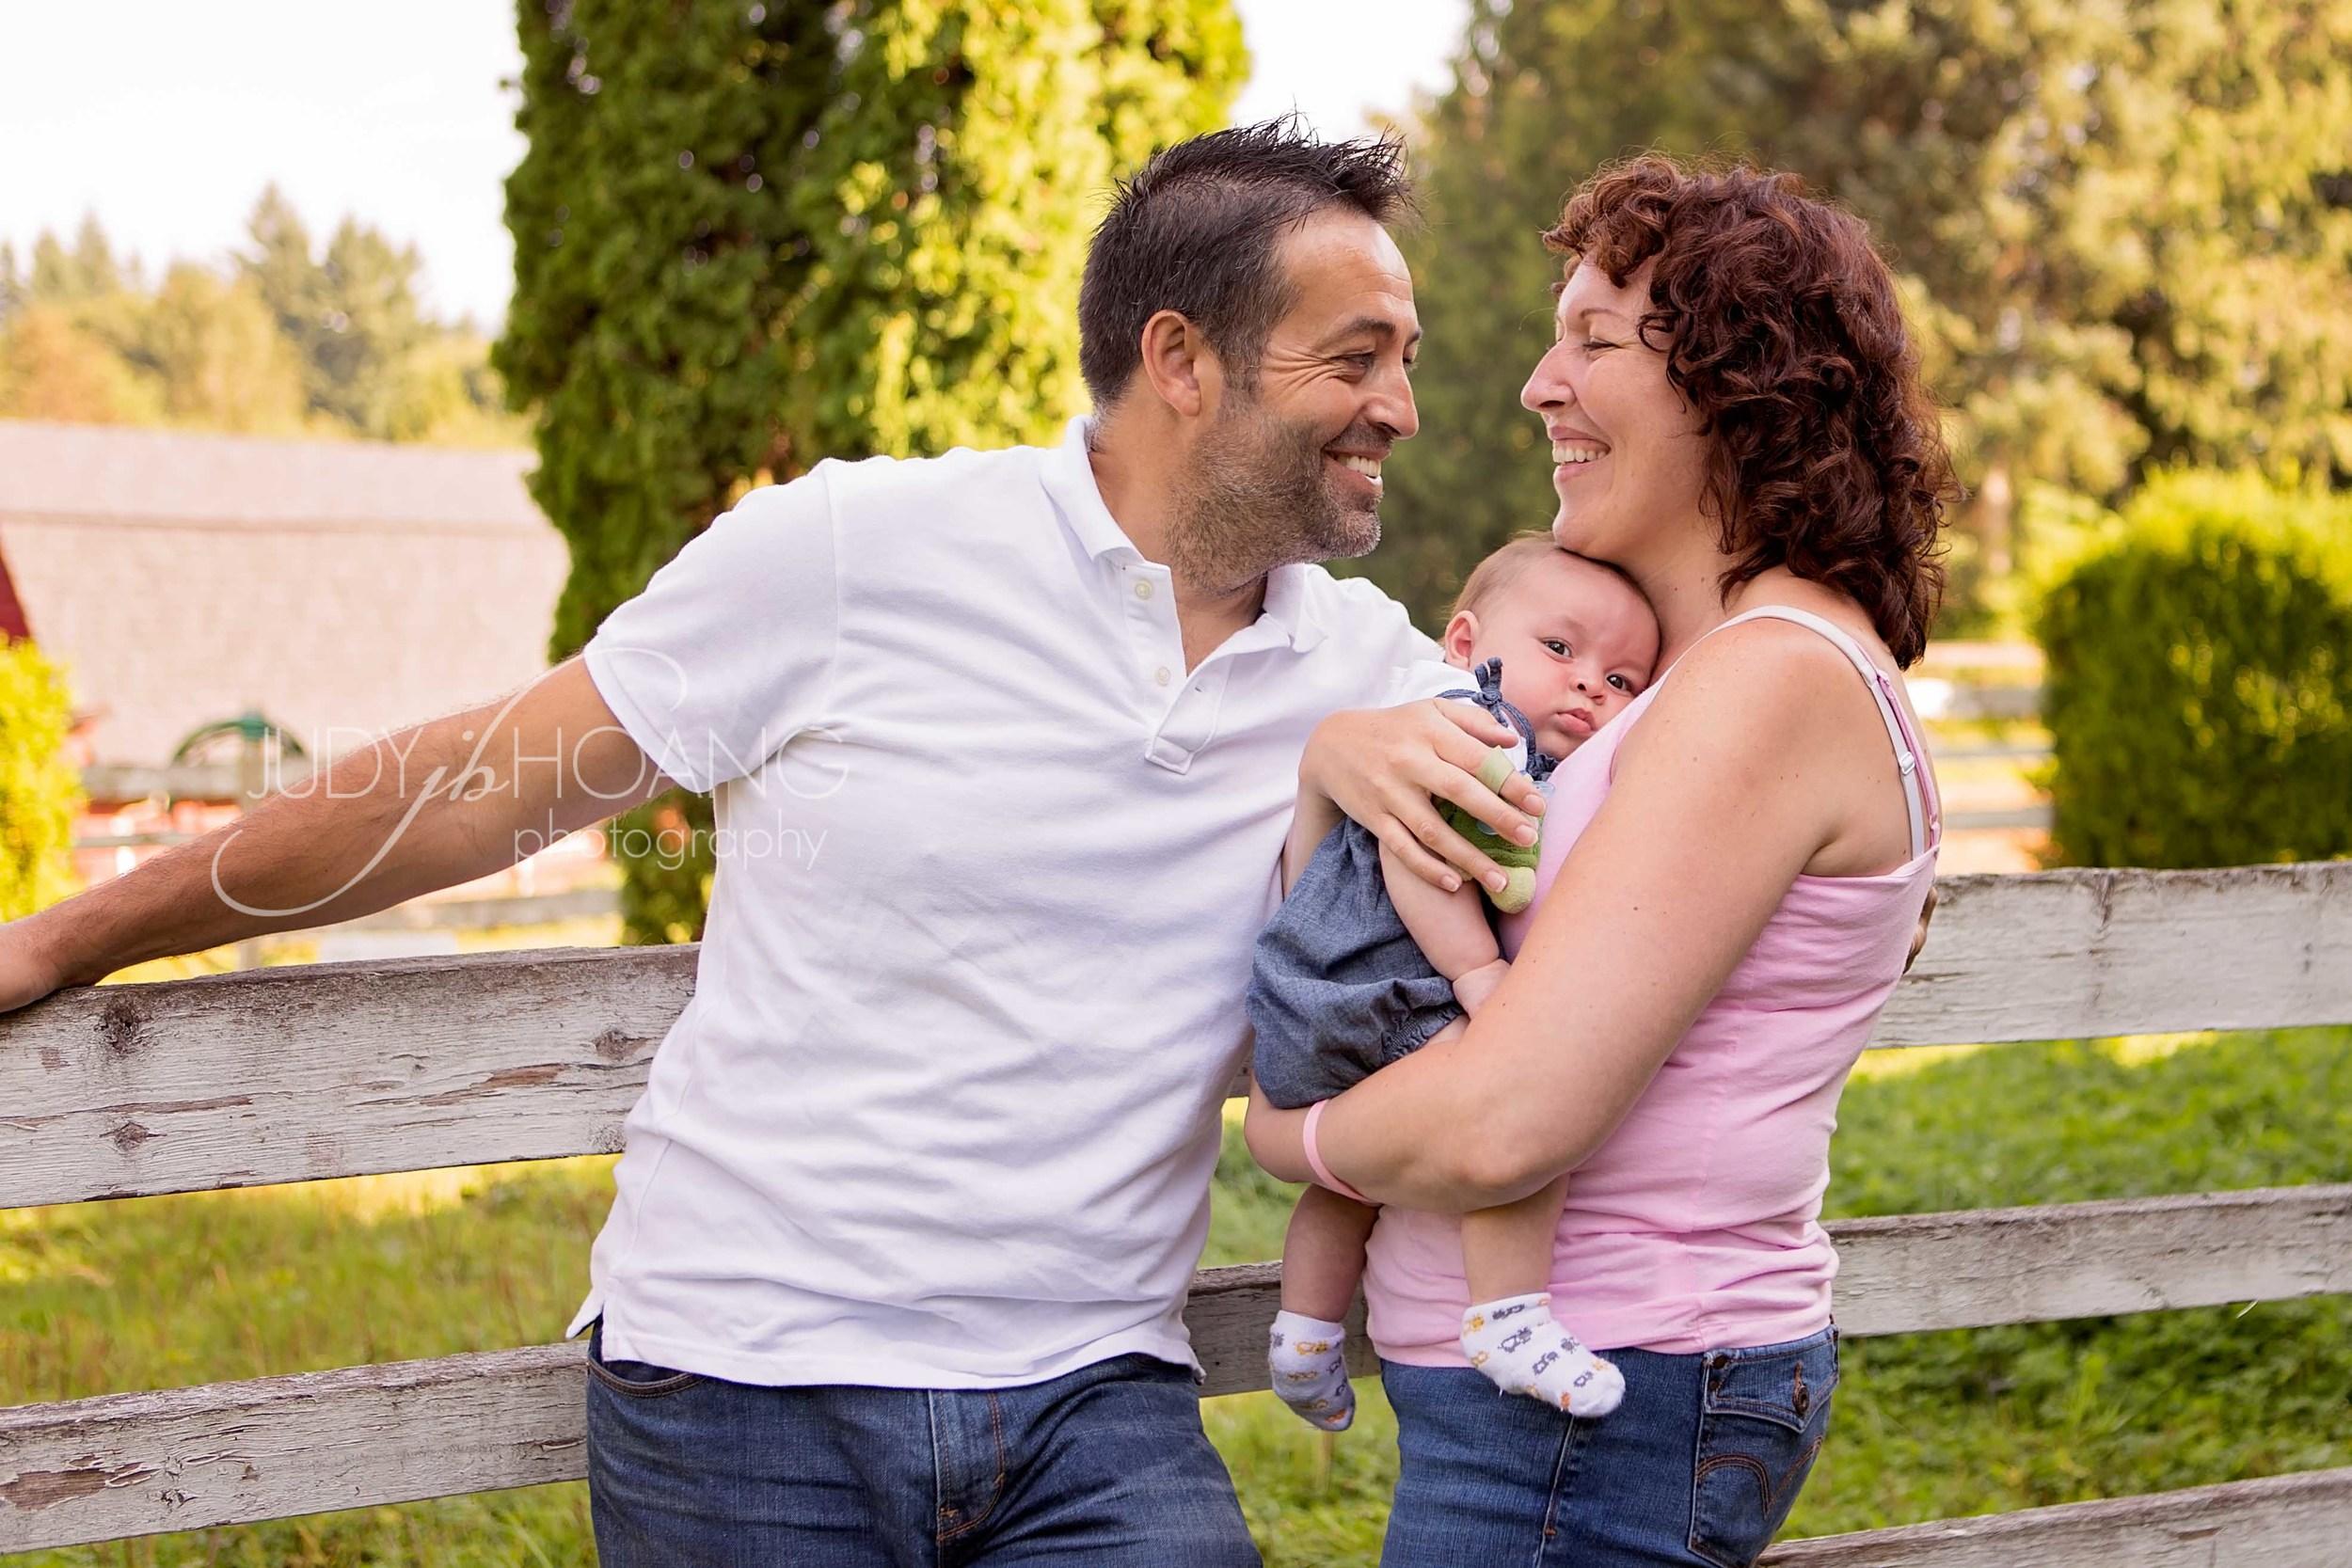 Judy Hoang Photography - Helen and Jorge Family-59.JPG